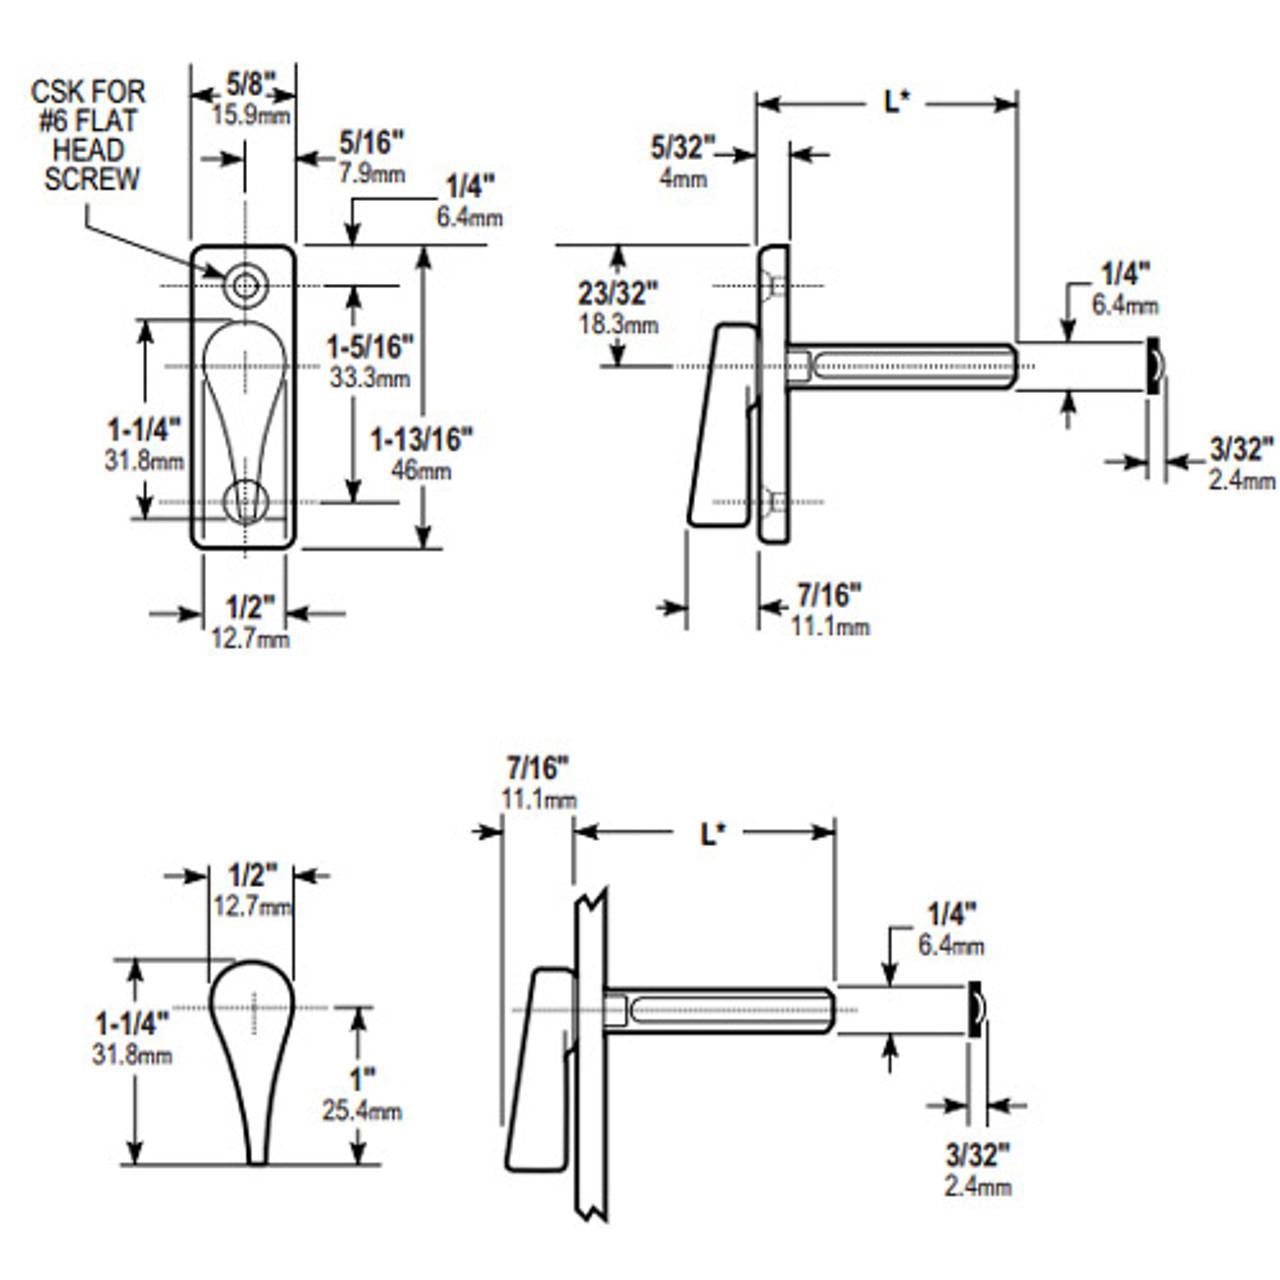 1000-21-12-121 Adams Rite 1000 Series Turns Dimensional View